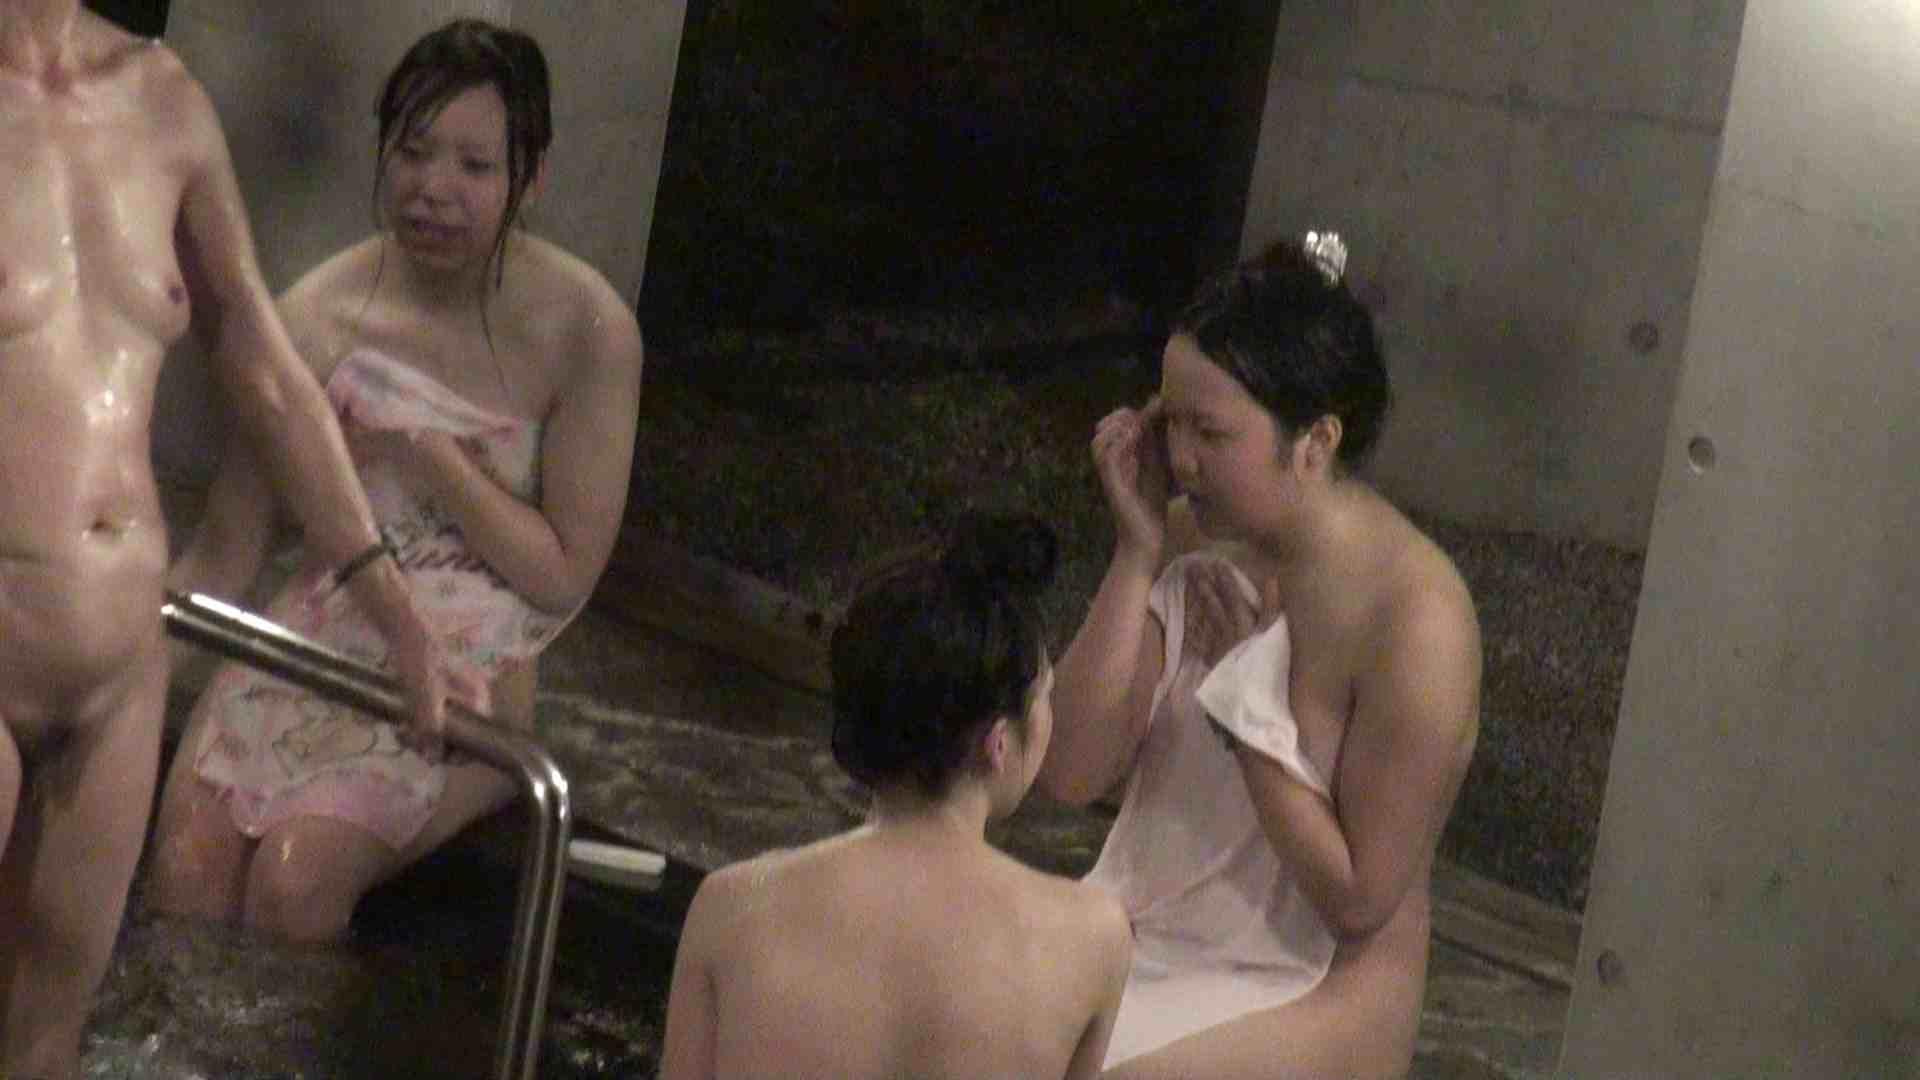 Aquaな露天風呂Vol.383 OLセックス 覗き性交動画流出 103画像 89